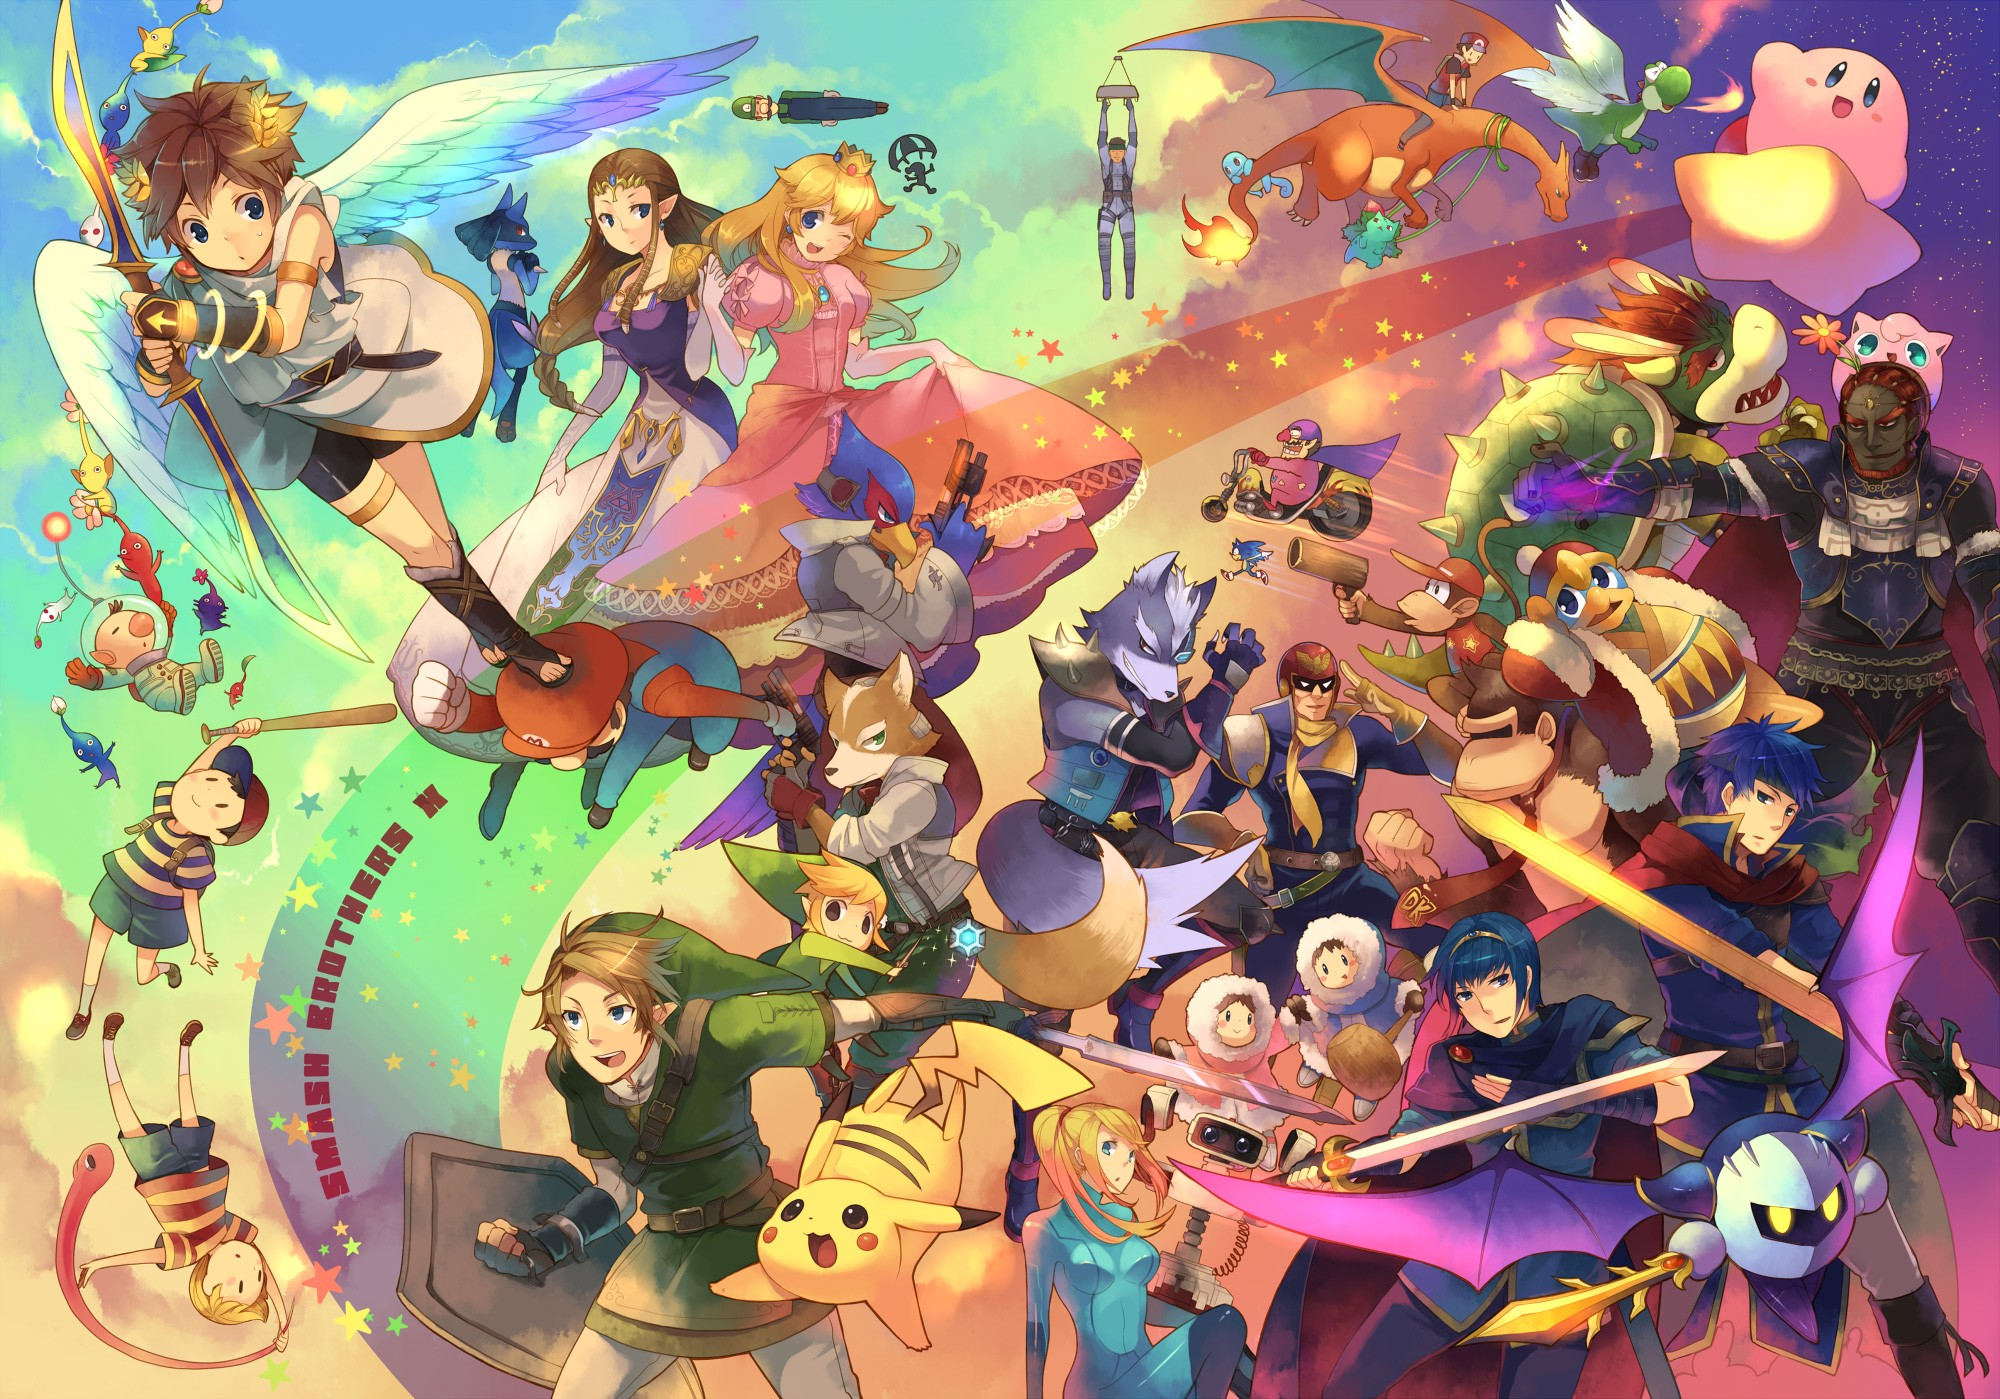 Telecharger Super Smash Bros Brawl Pour Pc Download